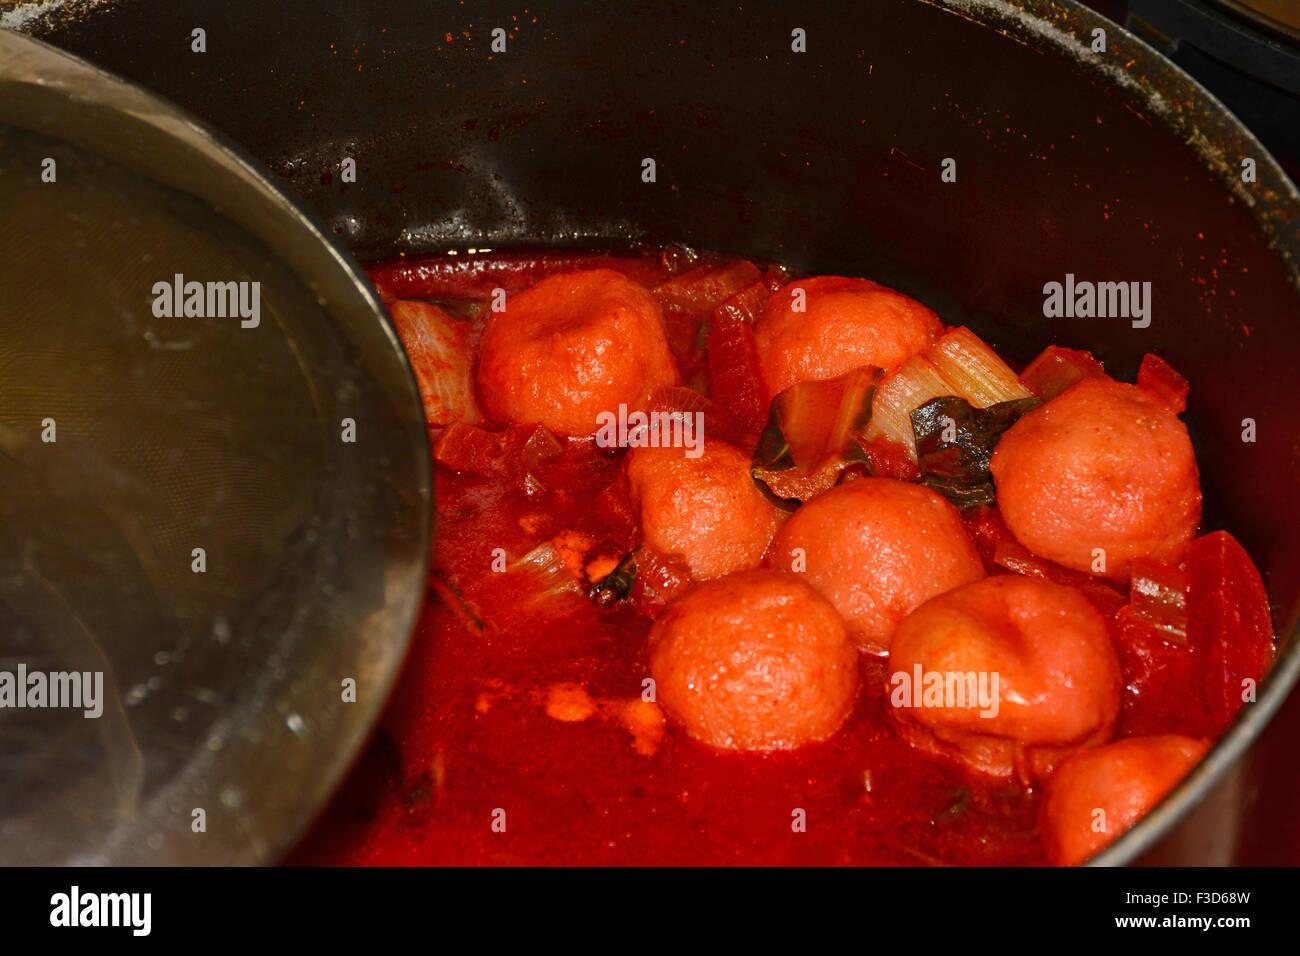 In Medio Oriente la cucina casalinga, Kube Immagini Stock